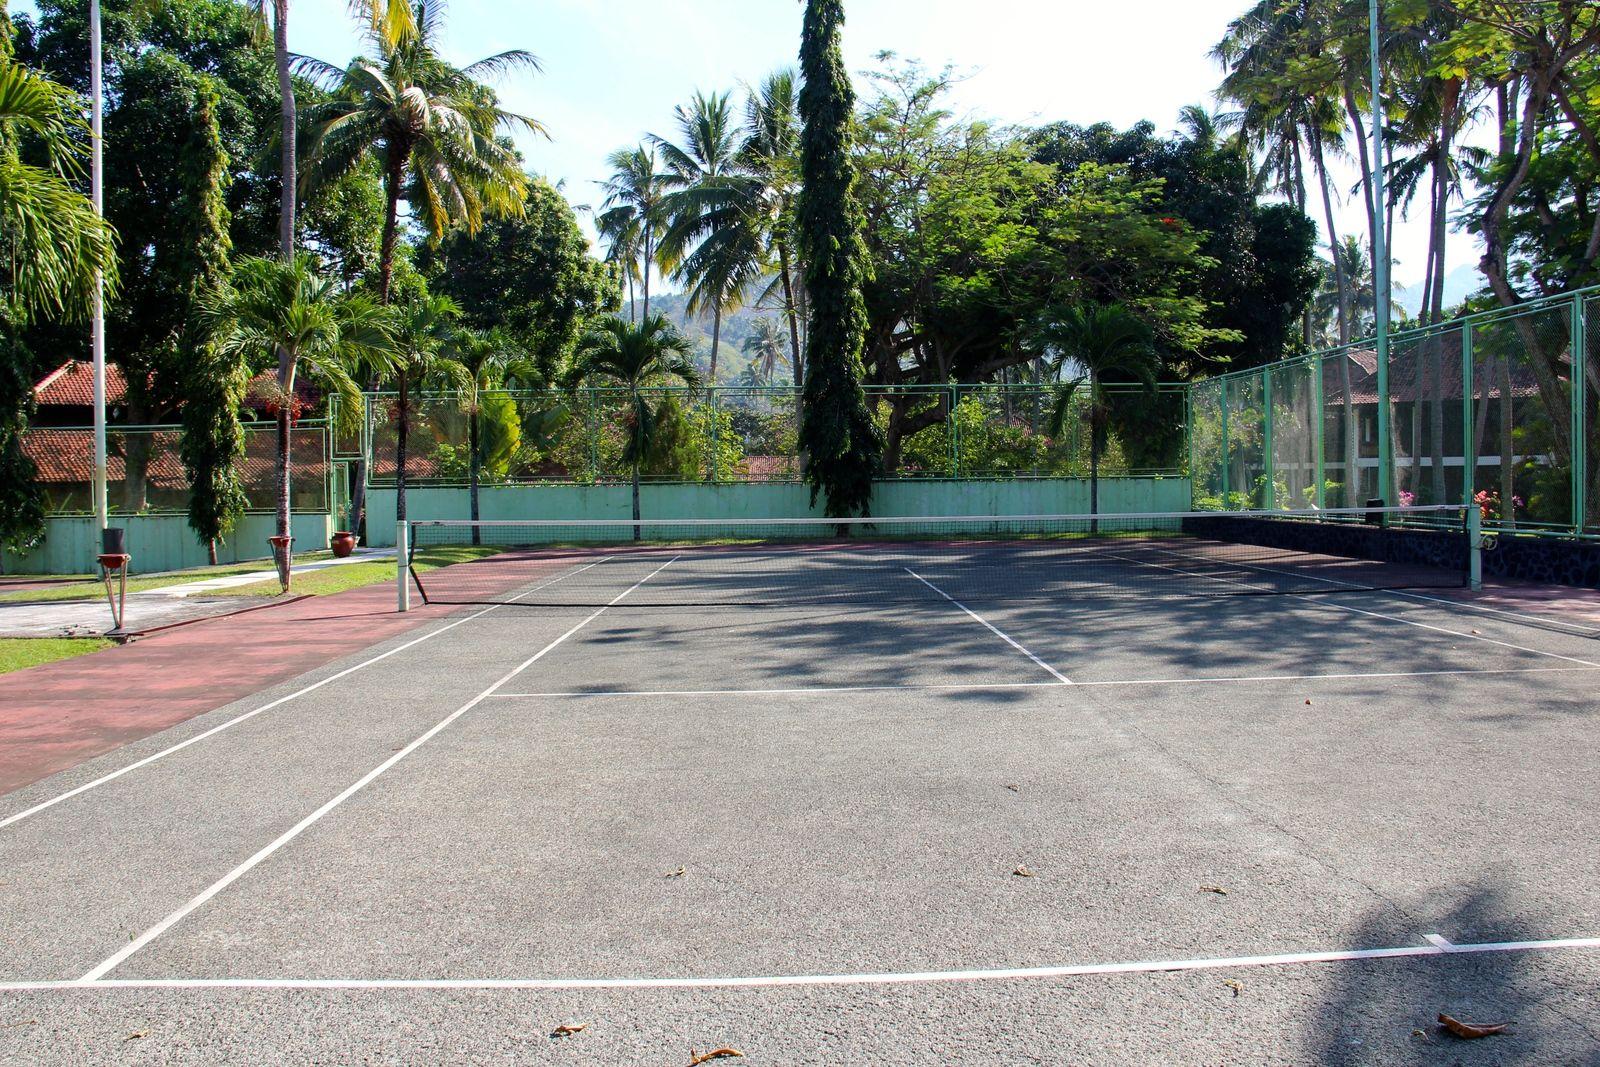 tennis-tourist-senggigi-lombok-poolvillaclub-tennis-court-teri-church